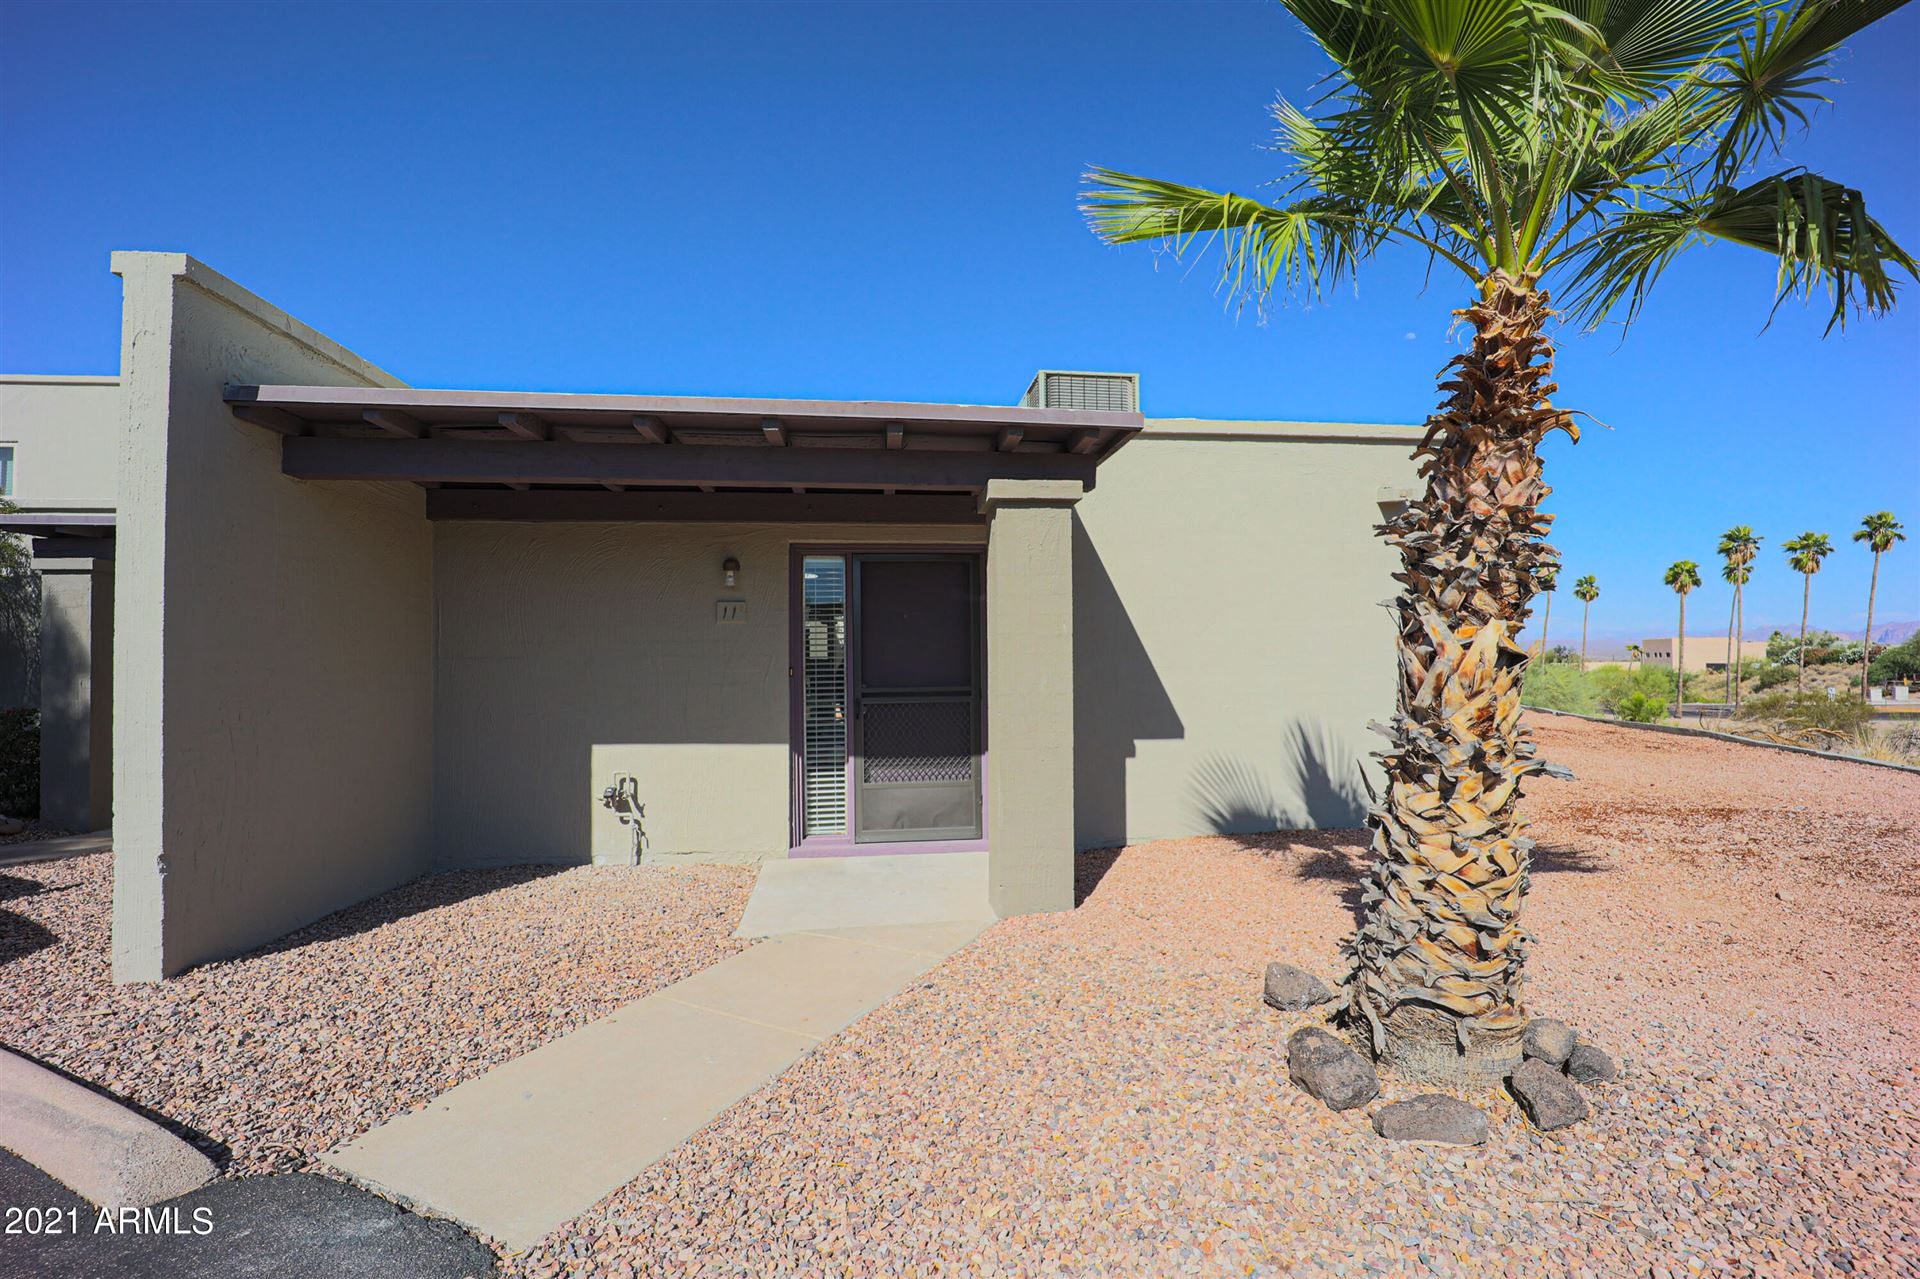 Photo of 16807 E Gunsight Drive #11, Fountain Hills, AZ 85268 (MLS # 6233104)